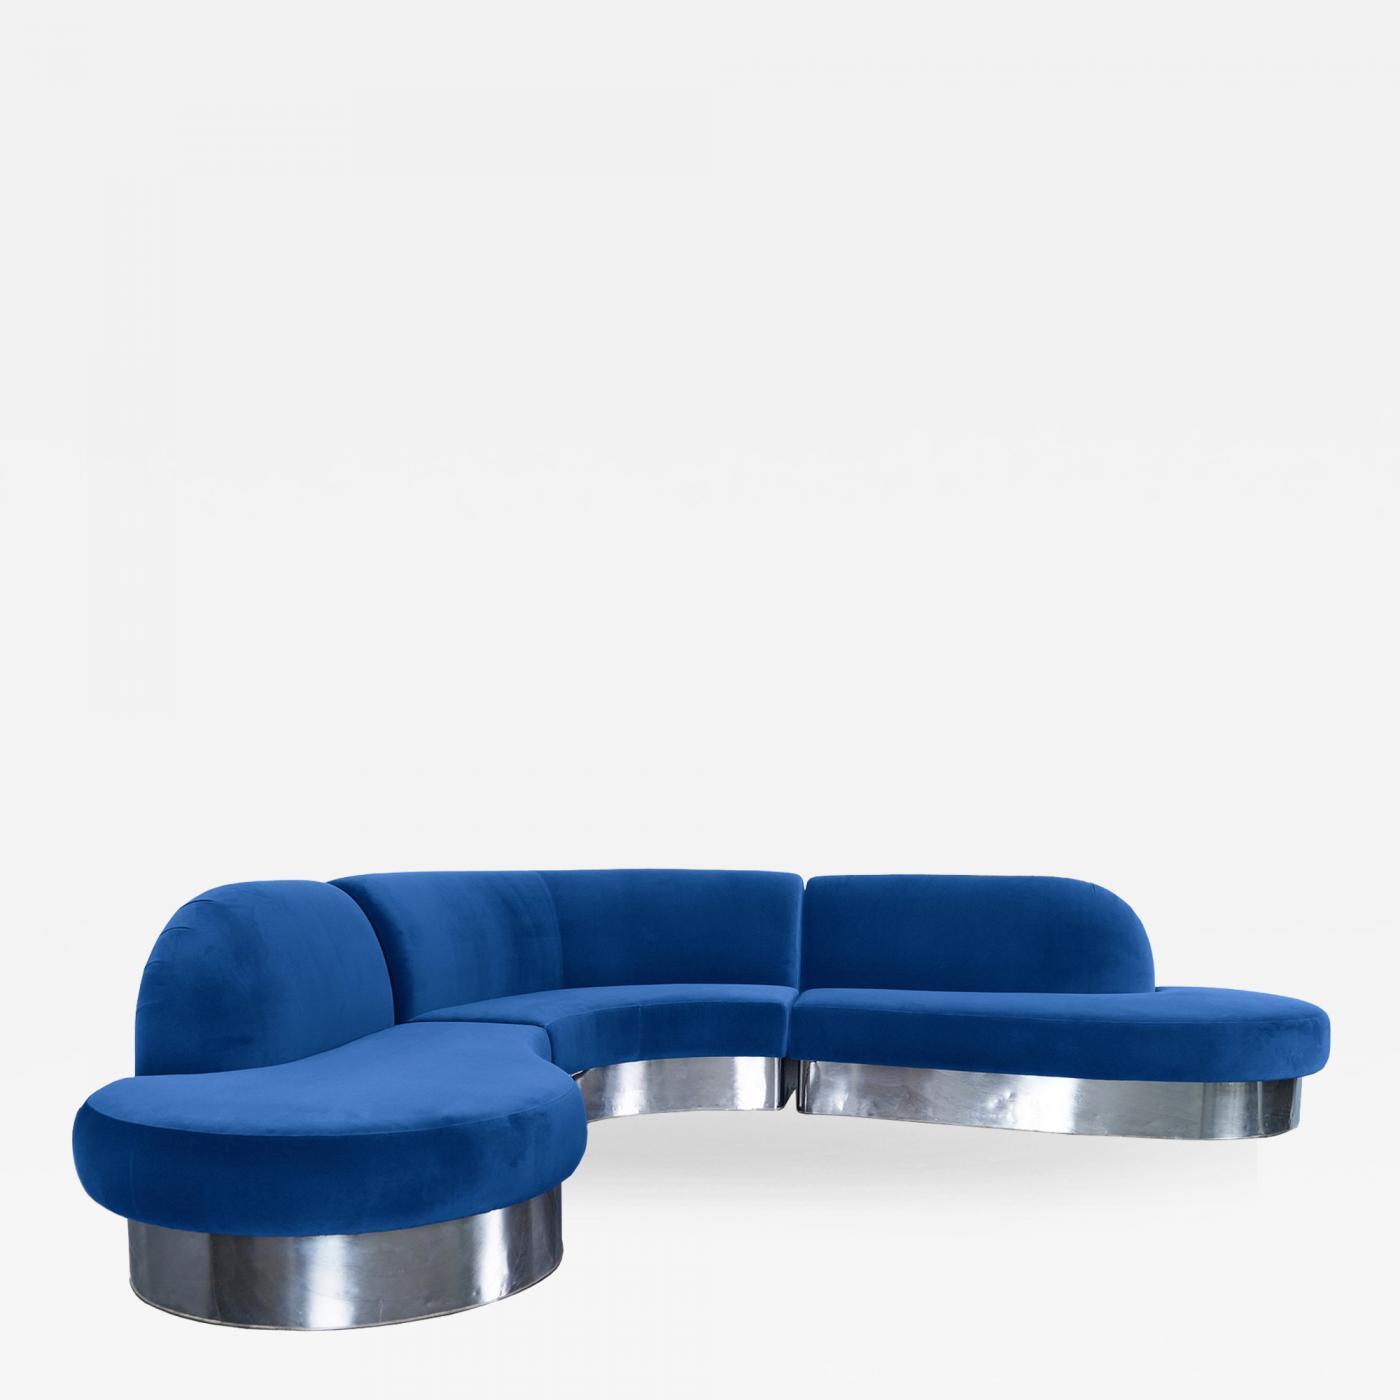 Listings / Furniture / Seating / Sofas